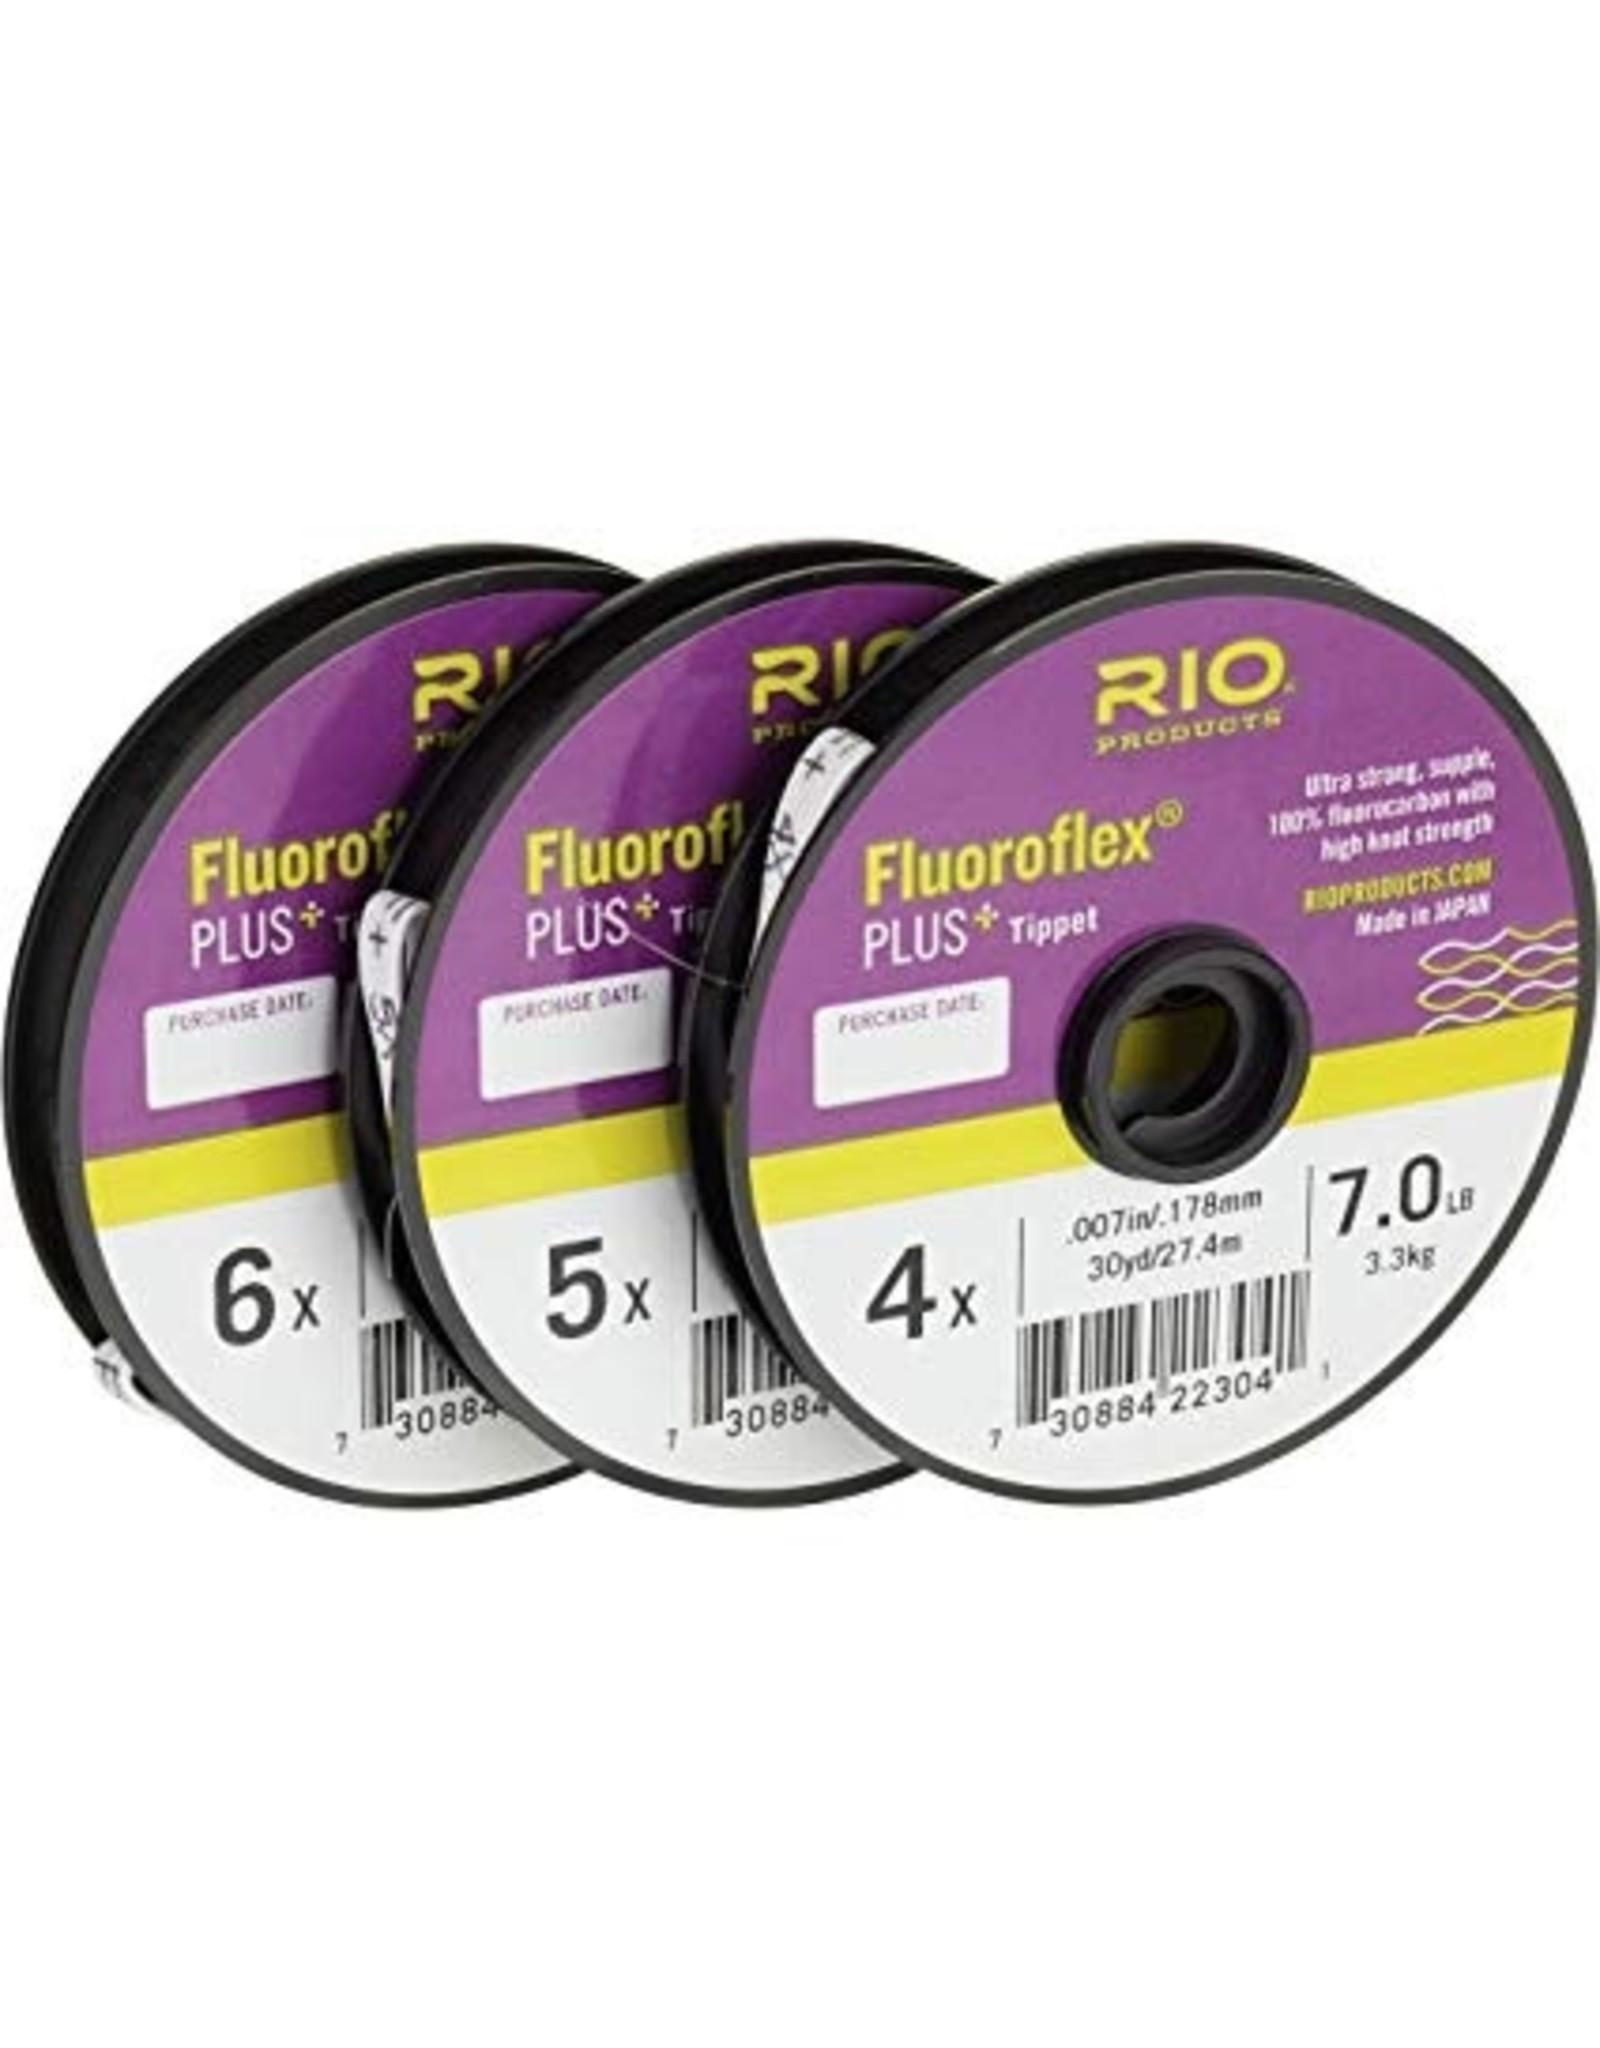 Rio Fluoro flex Plus Tippet (3 Pack, 4X, 5X, 6X